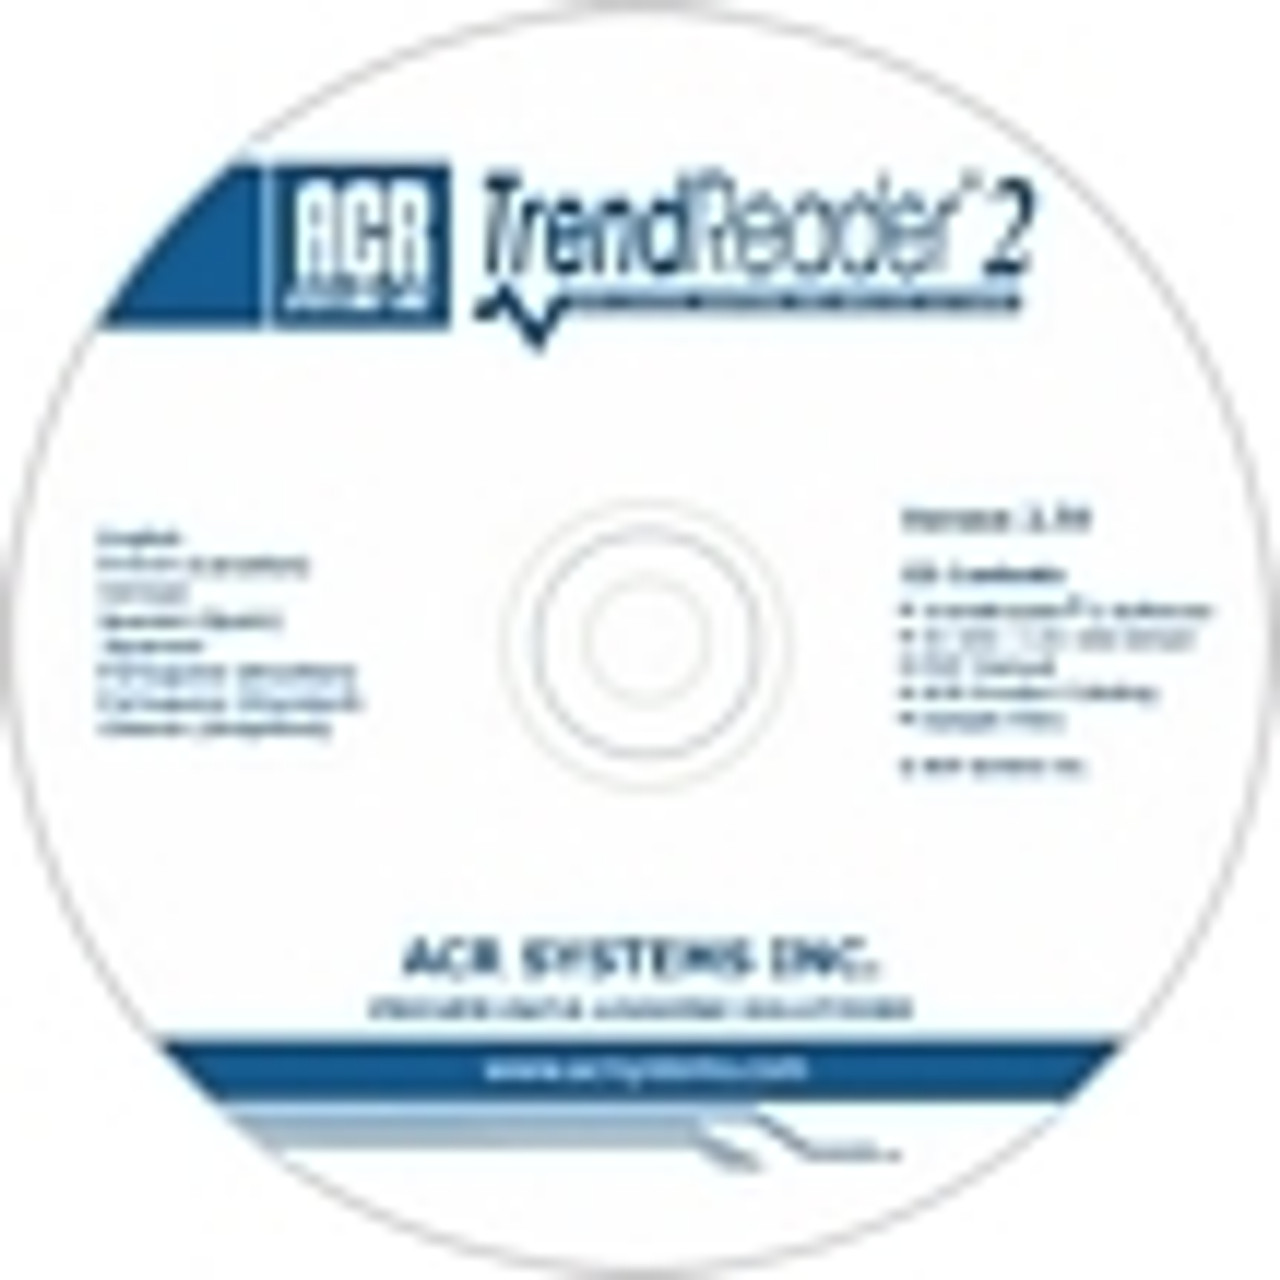 TrendReader 2 software.